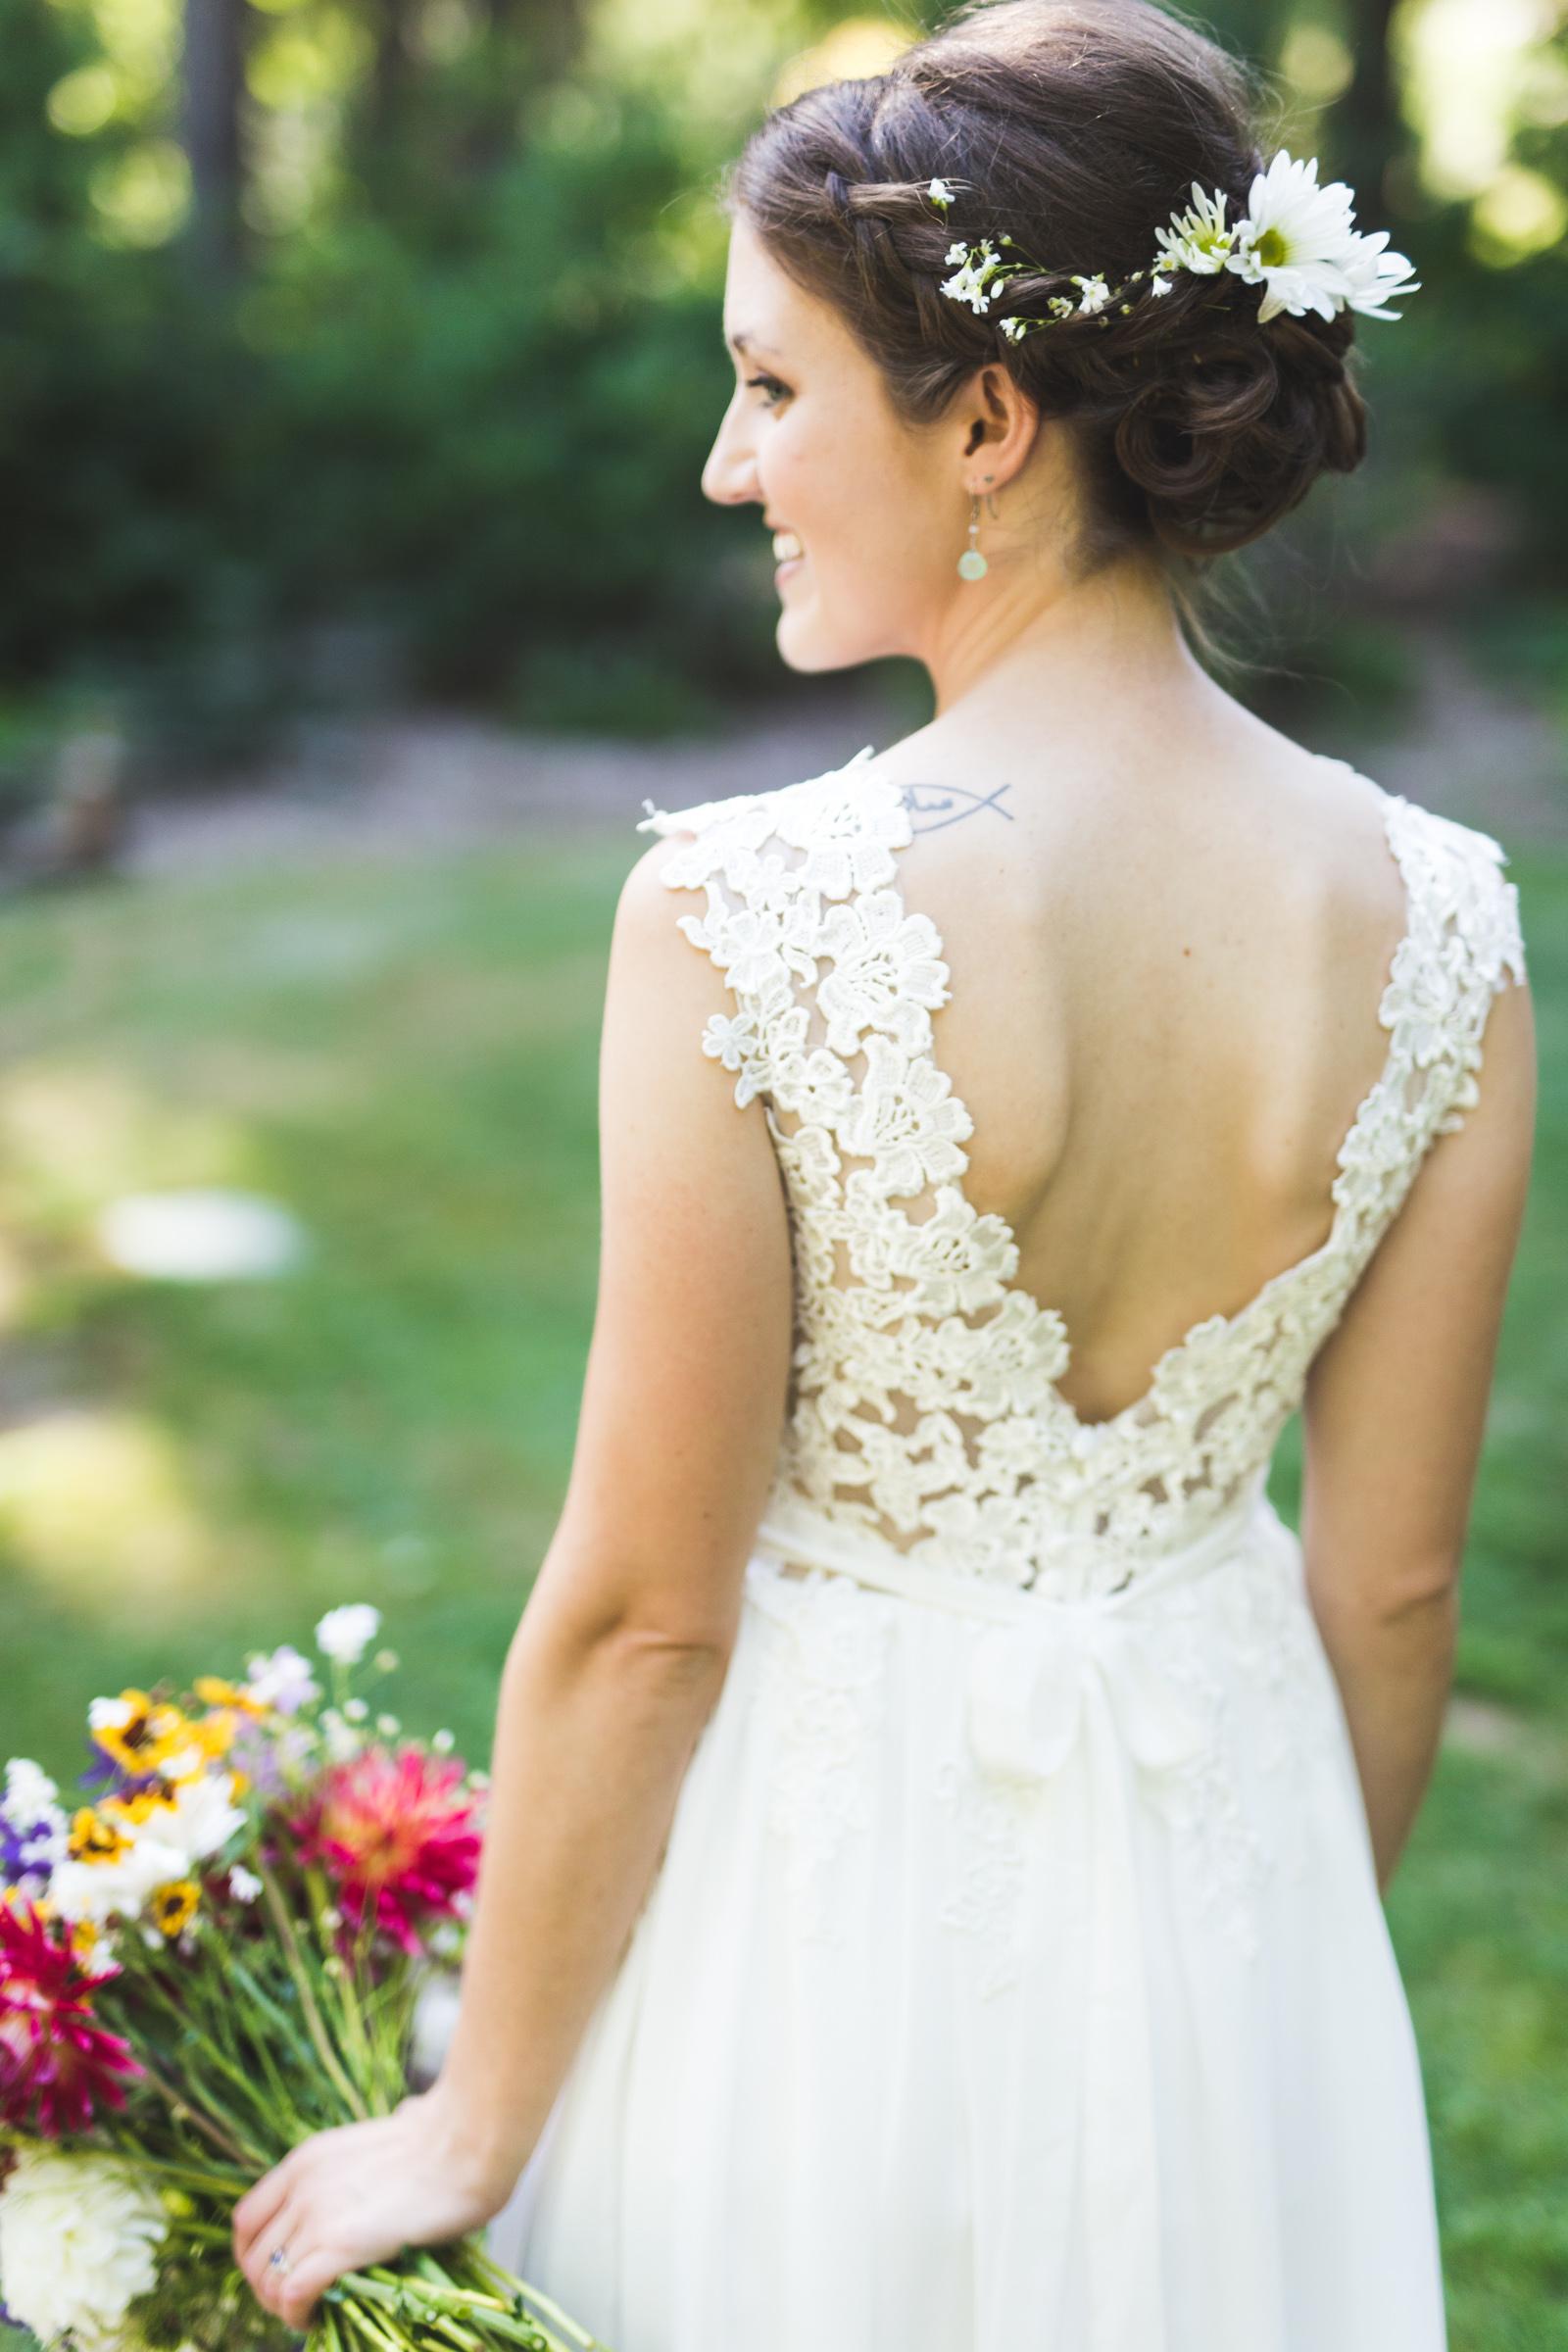 LukeSarah-Seattle-Wedding-080516-0064.jpg